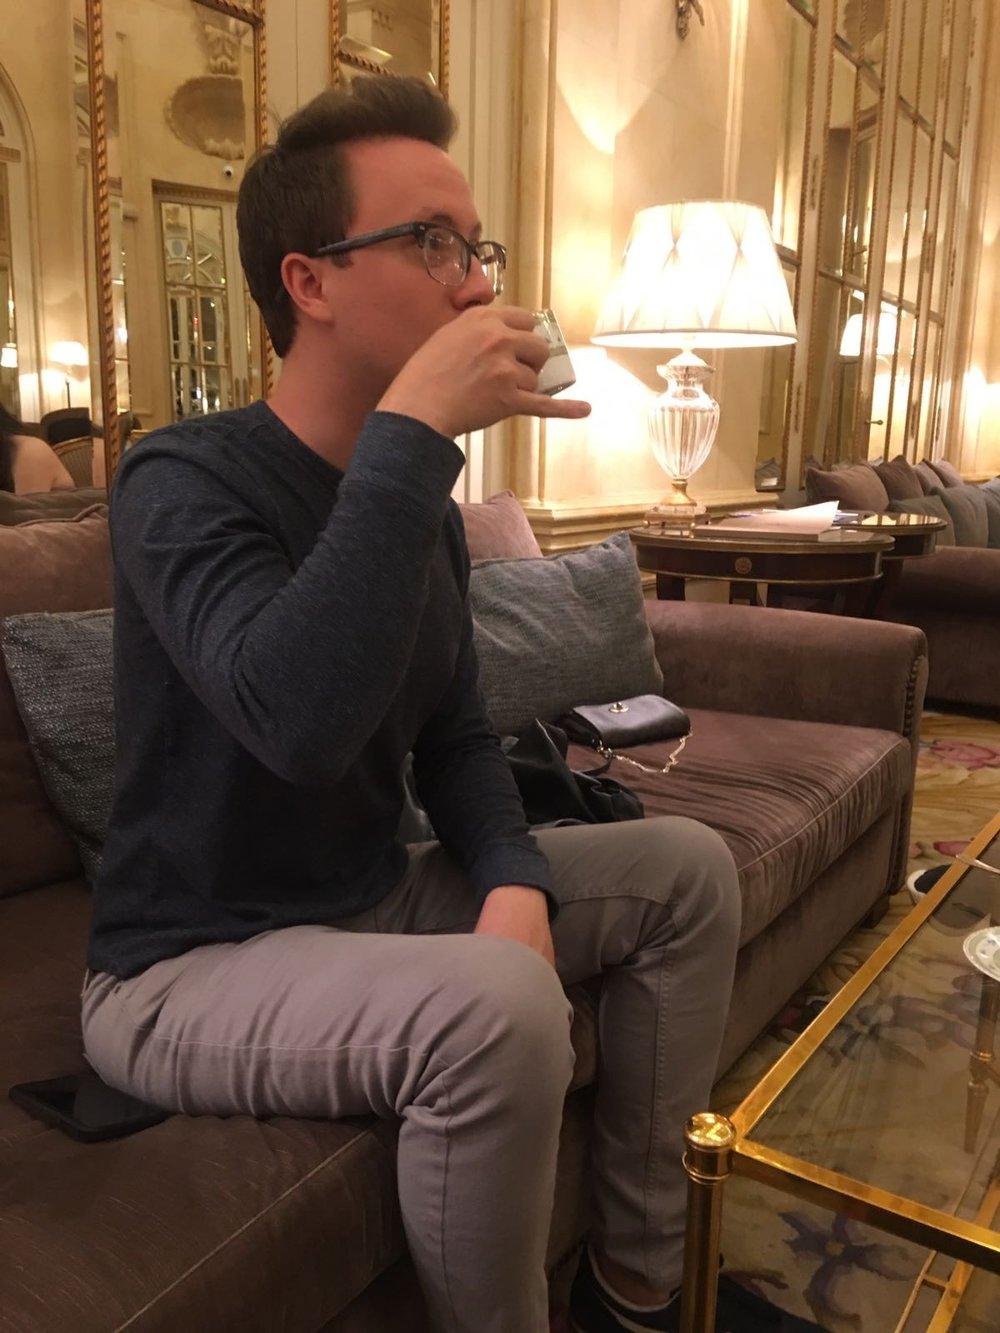 Proper drinking posture